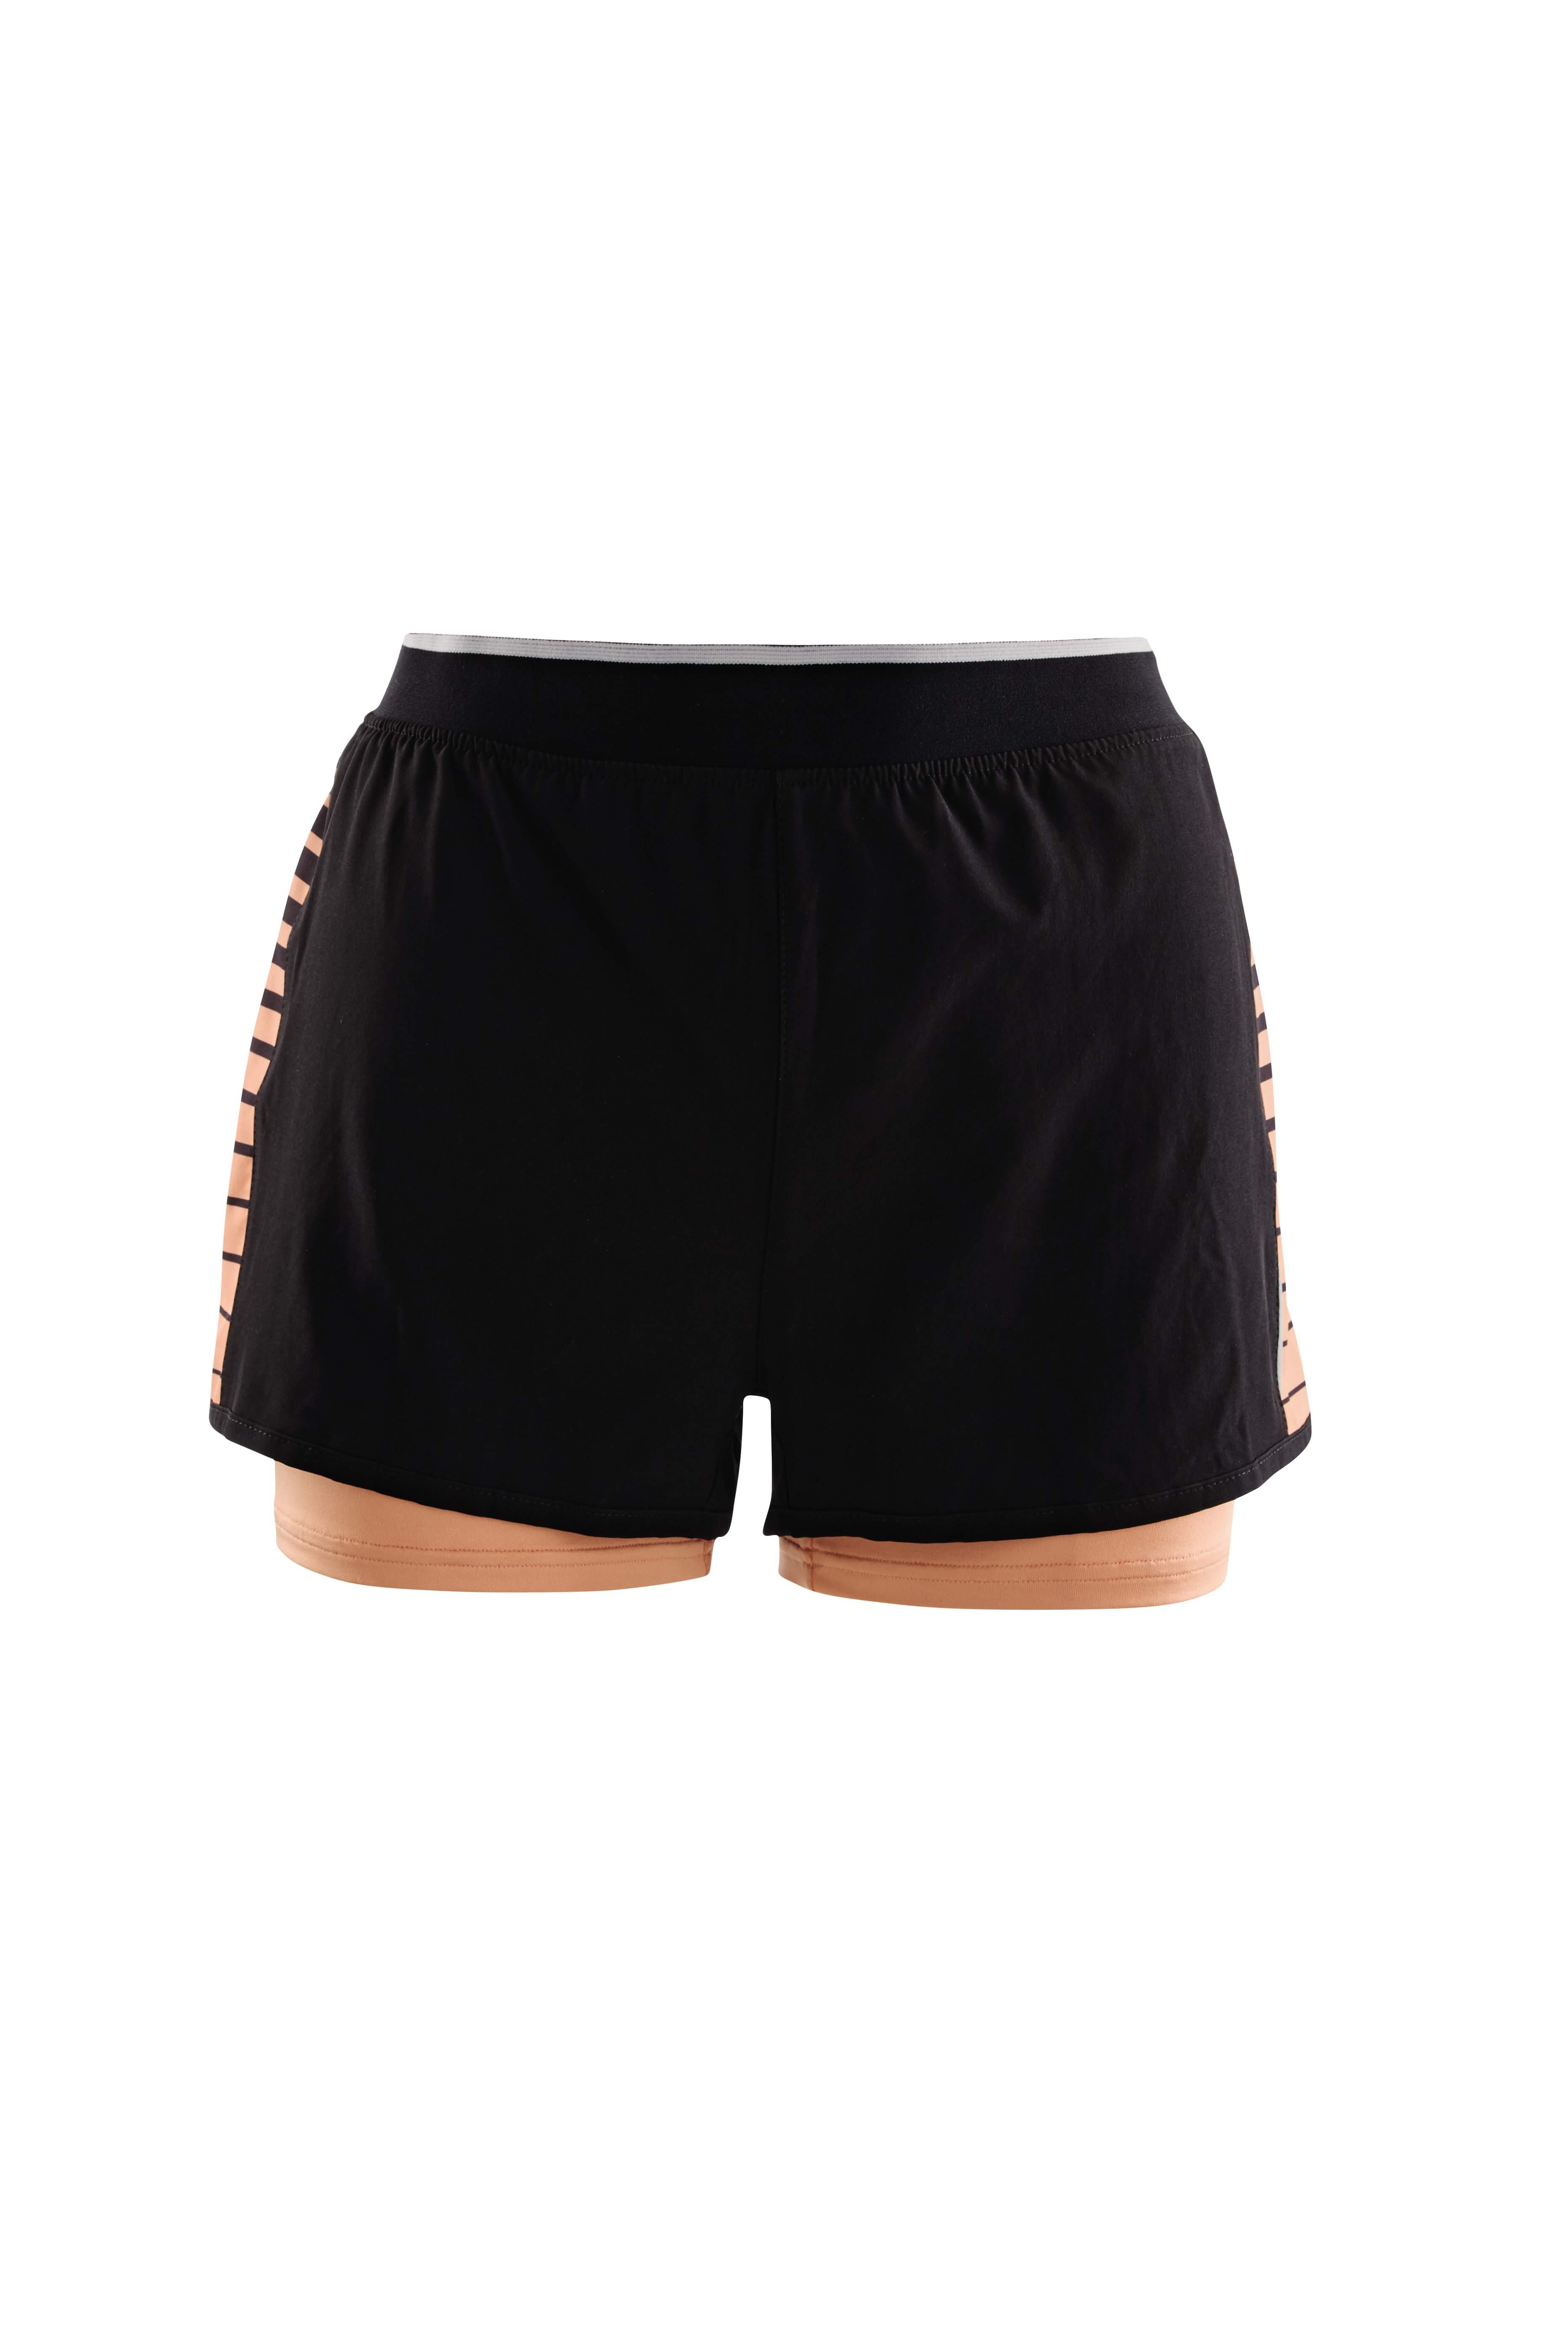 aldi cross training gear - shorts